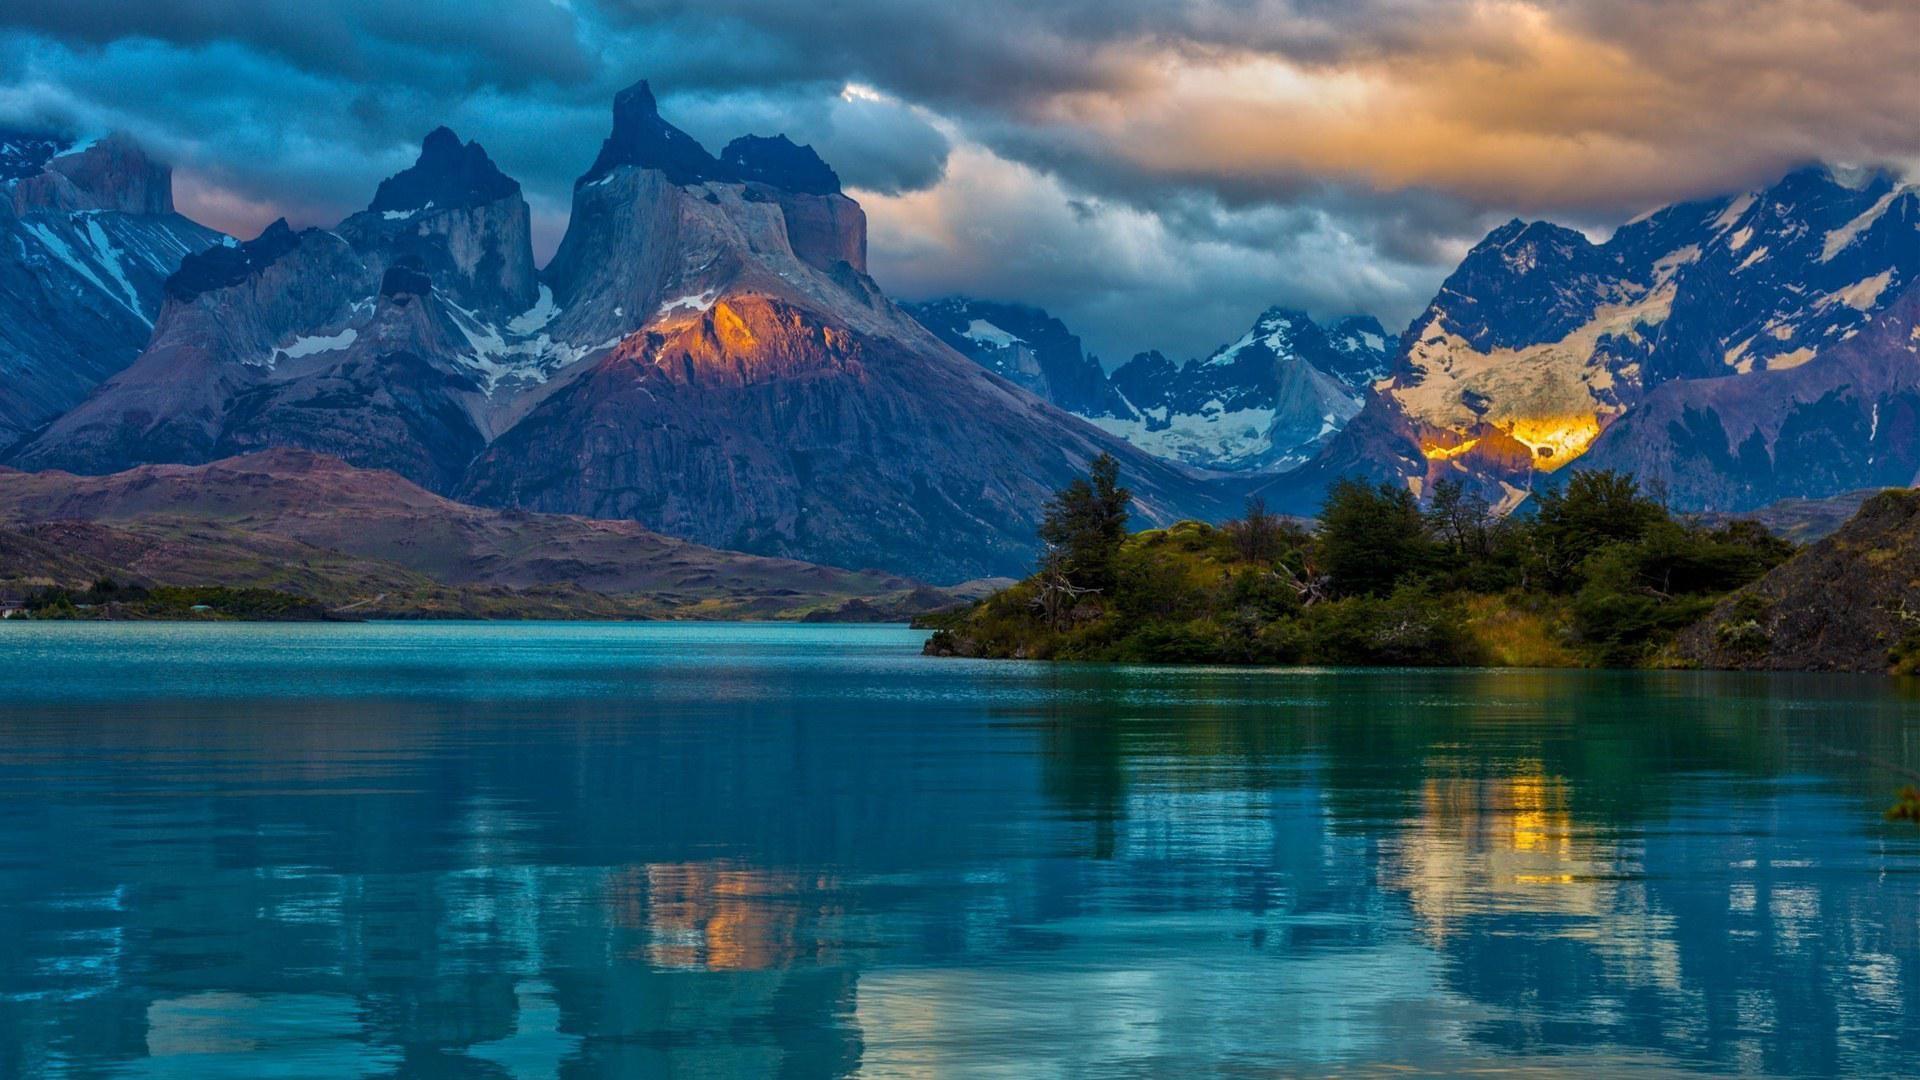 Landscape Argentina Hd Desktop Wallpaper Widescreen High Definition Fullscreen Landscape Nature Landscape Wallpaper